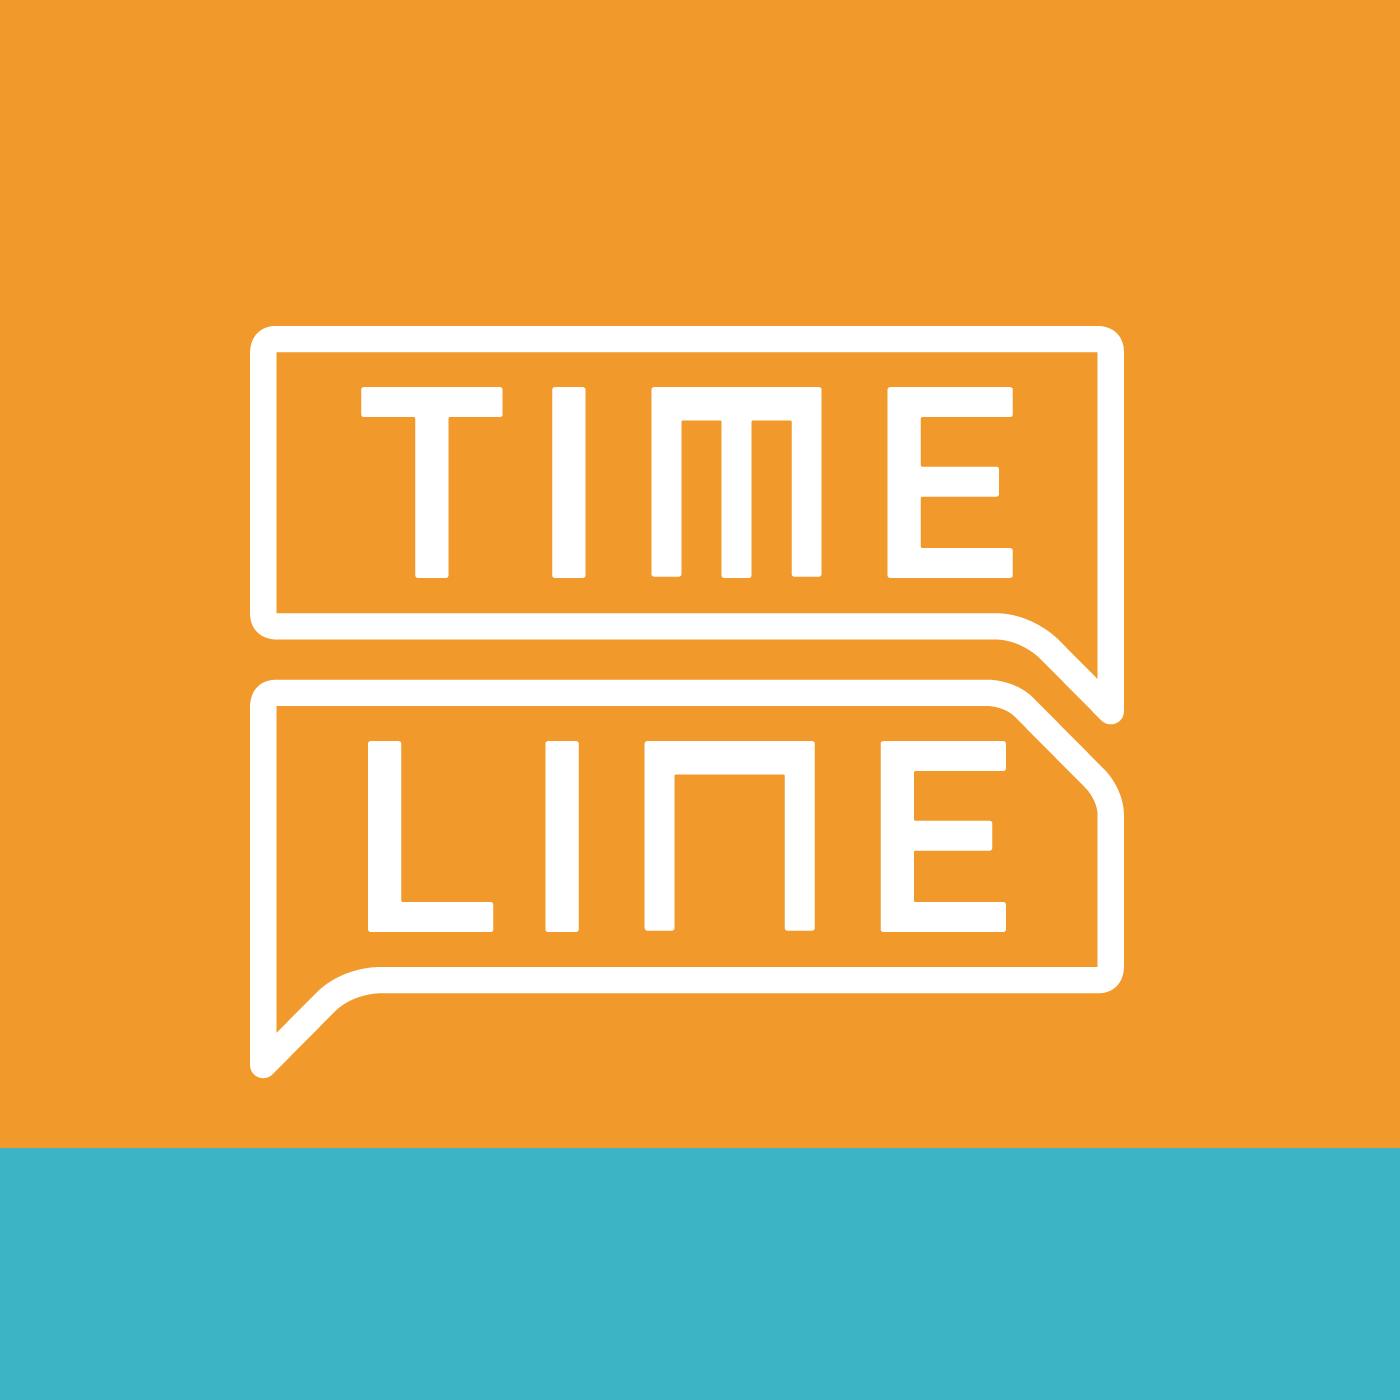 Timeline Gaúcha 01/09/2017